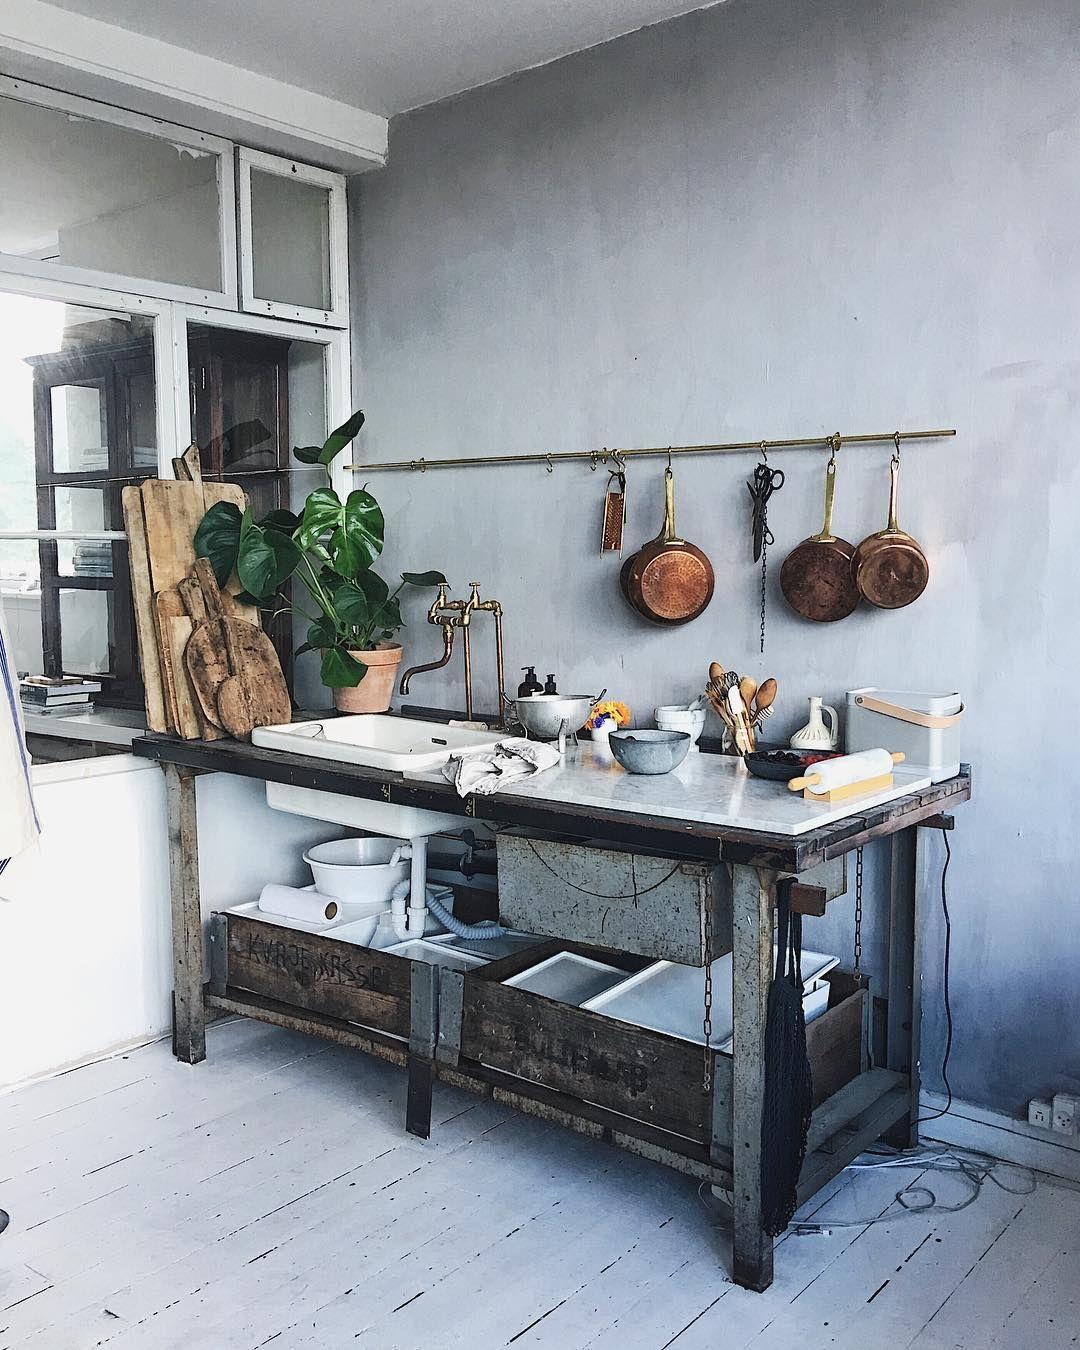 Signe Bay´s charming industrial kitchen in her Copenhagen studio ...